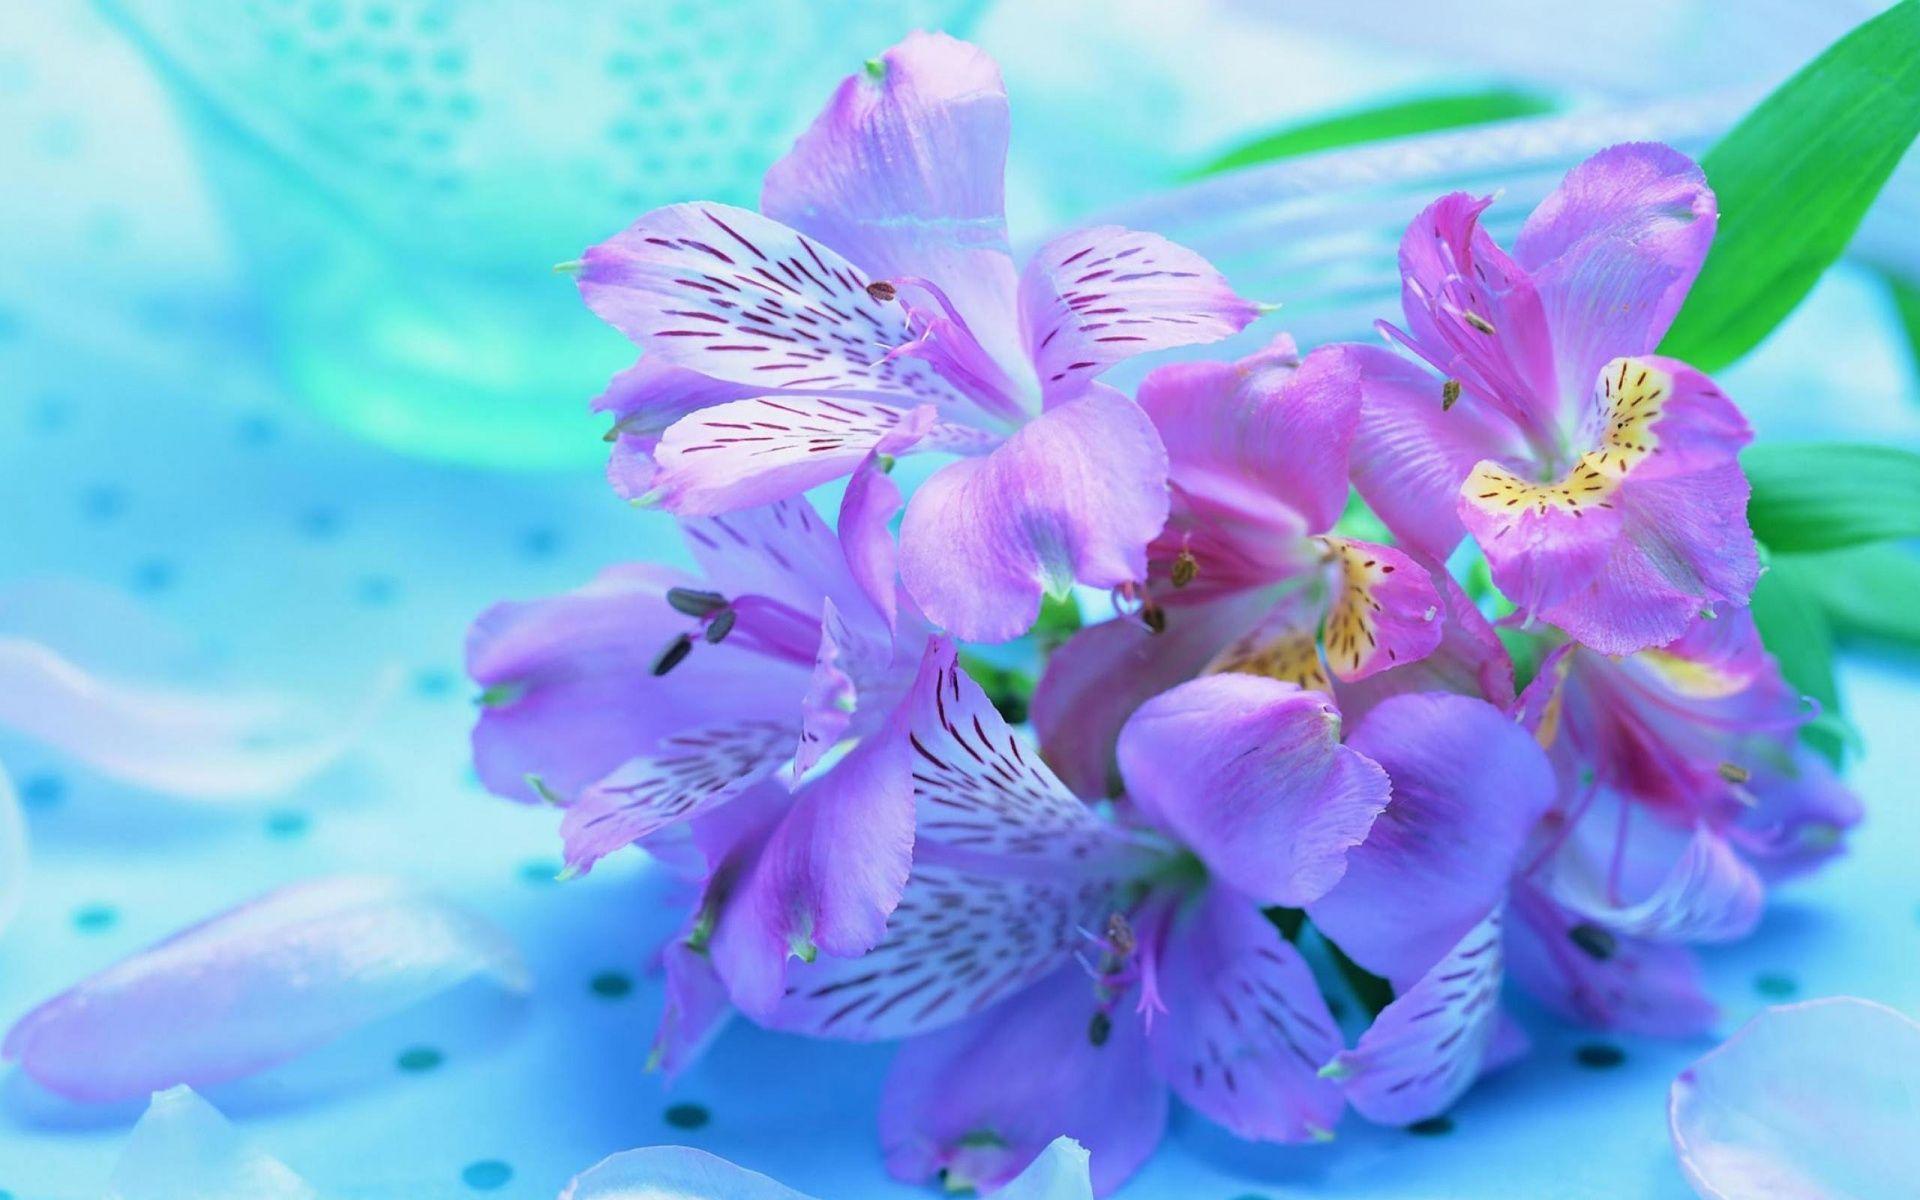 Pretty Flower pretty flower wallpaper full hd #rls | earth | pinterest | flower